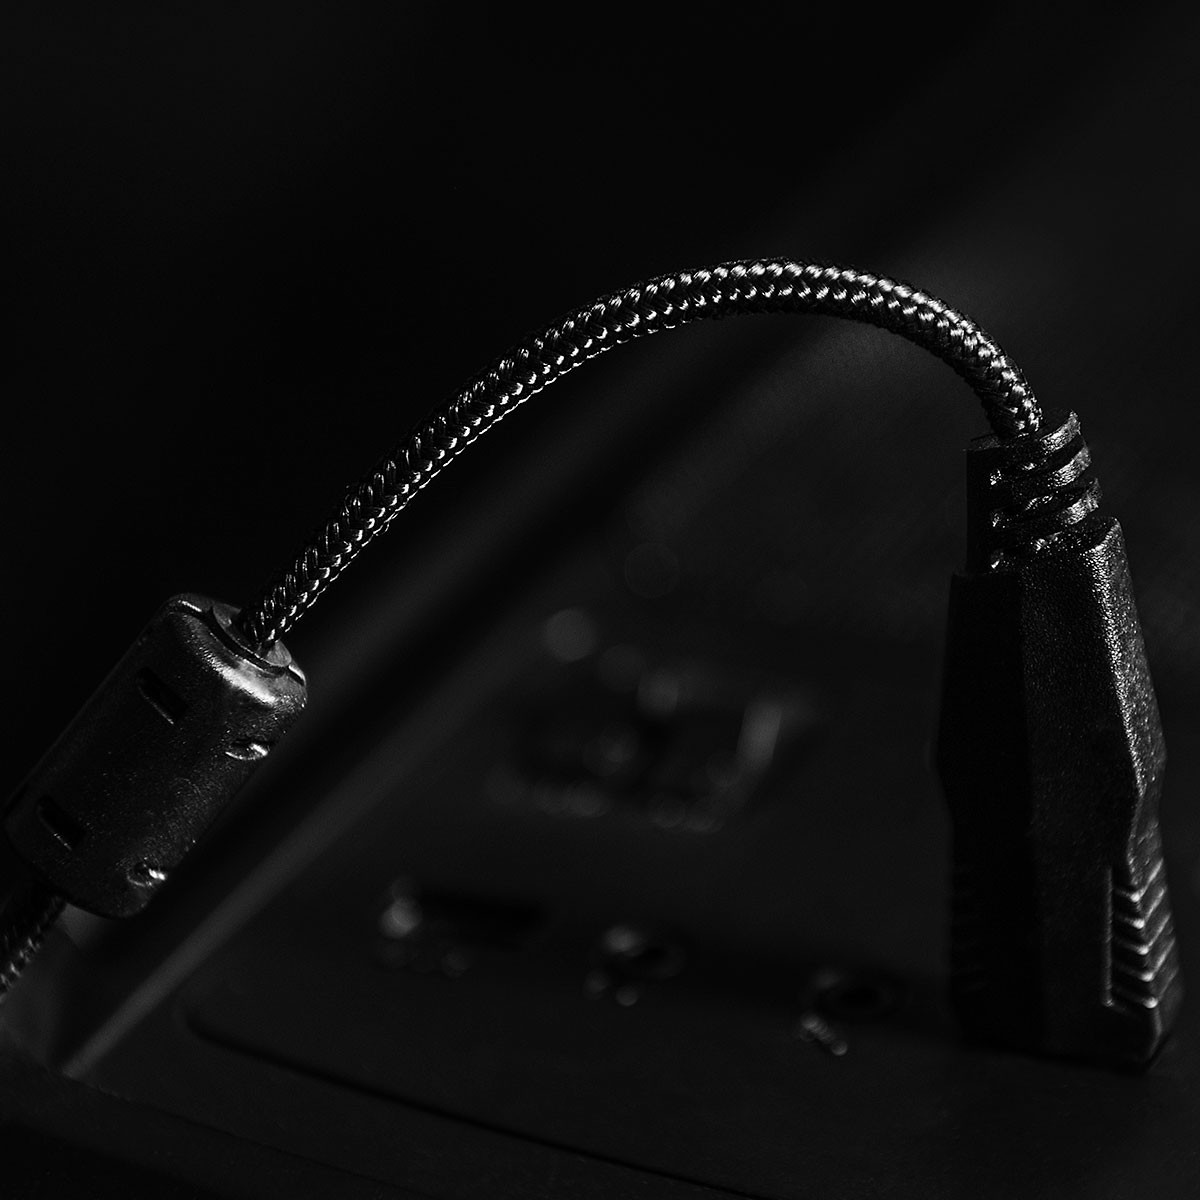 MODECOM Volcano MC-GMX3 black wired optical mouse RGB | 4000 DPI